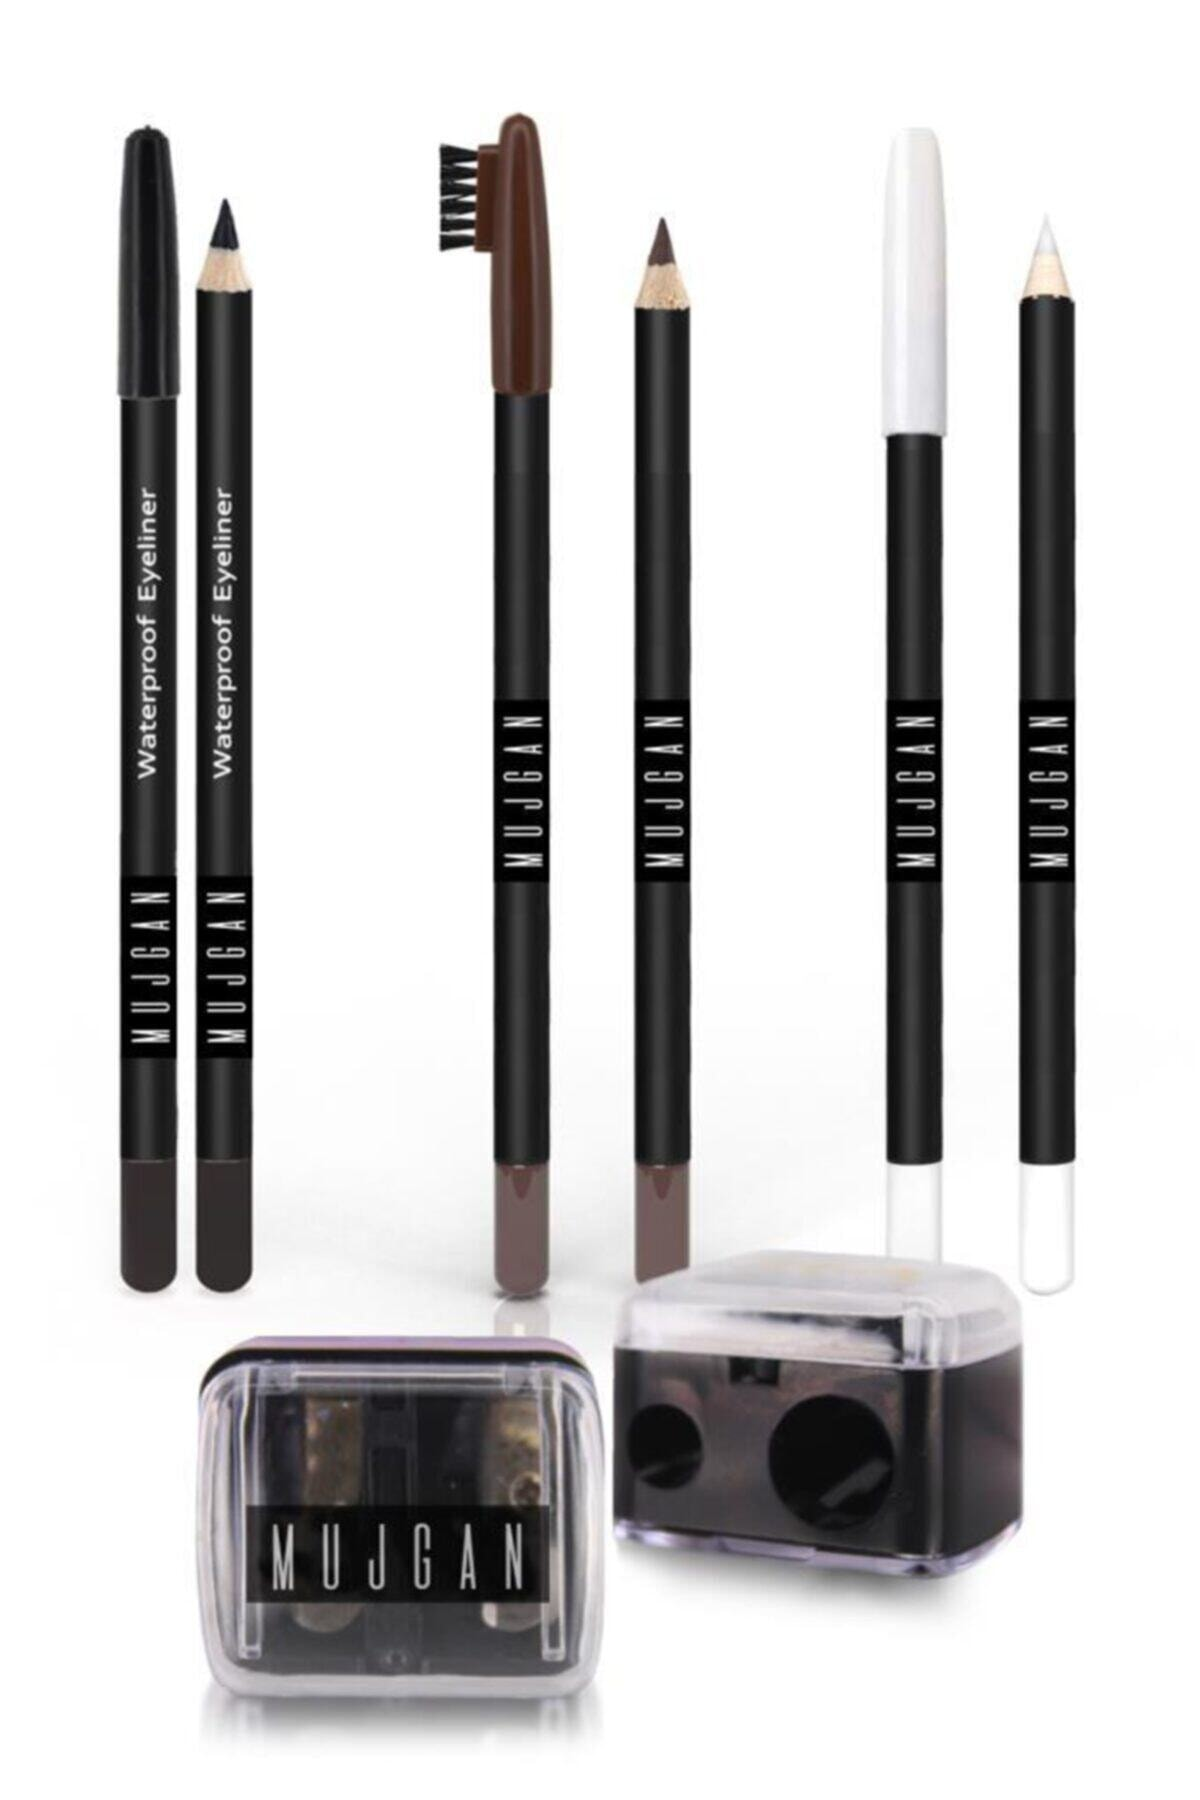 Siyah Göz Kalemi + Beyaz Göz Kalemi + Kahverengi Kaş Kalemi + Açacak 4'lü